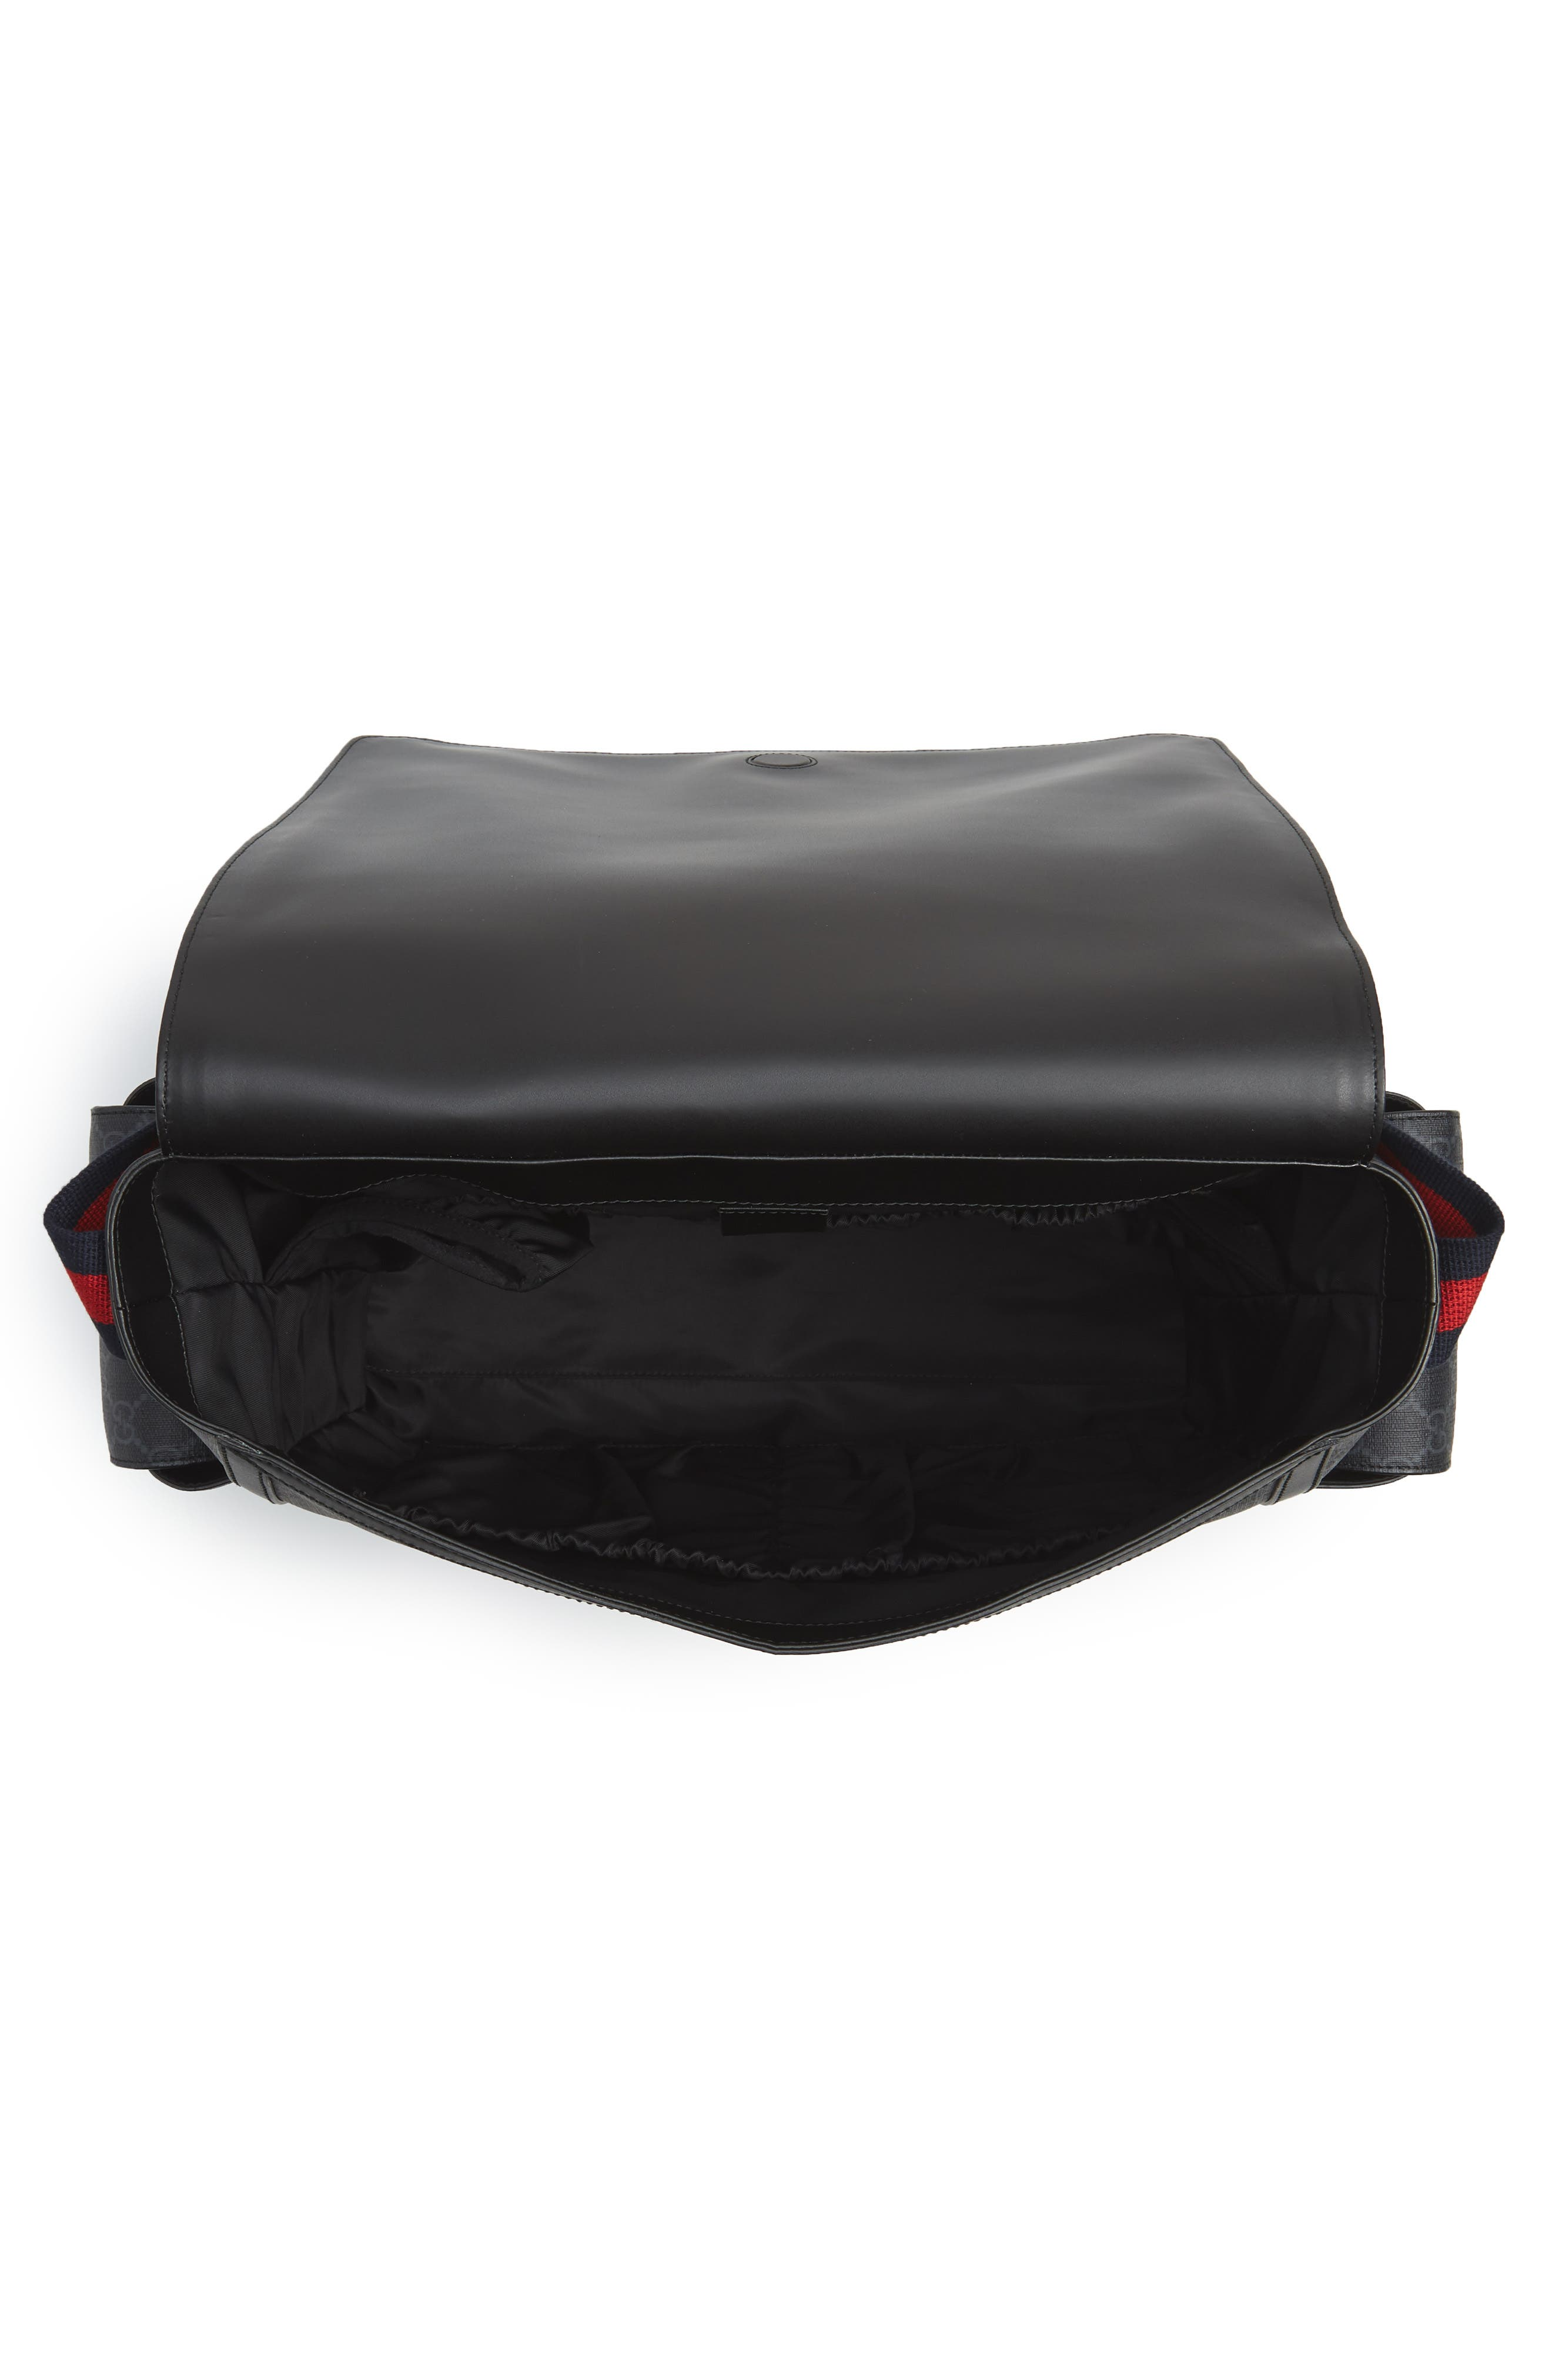 GG Supreme Canvas Diaper Bag,                             Alternate thumbnail 4, color,                             BLACK